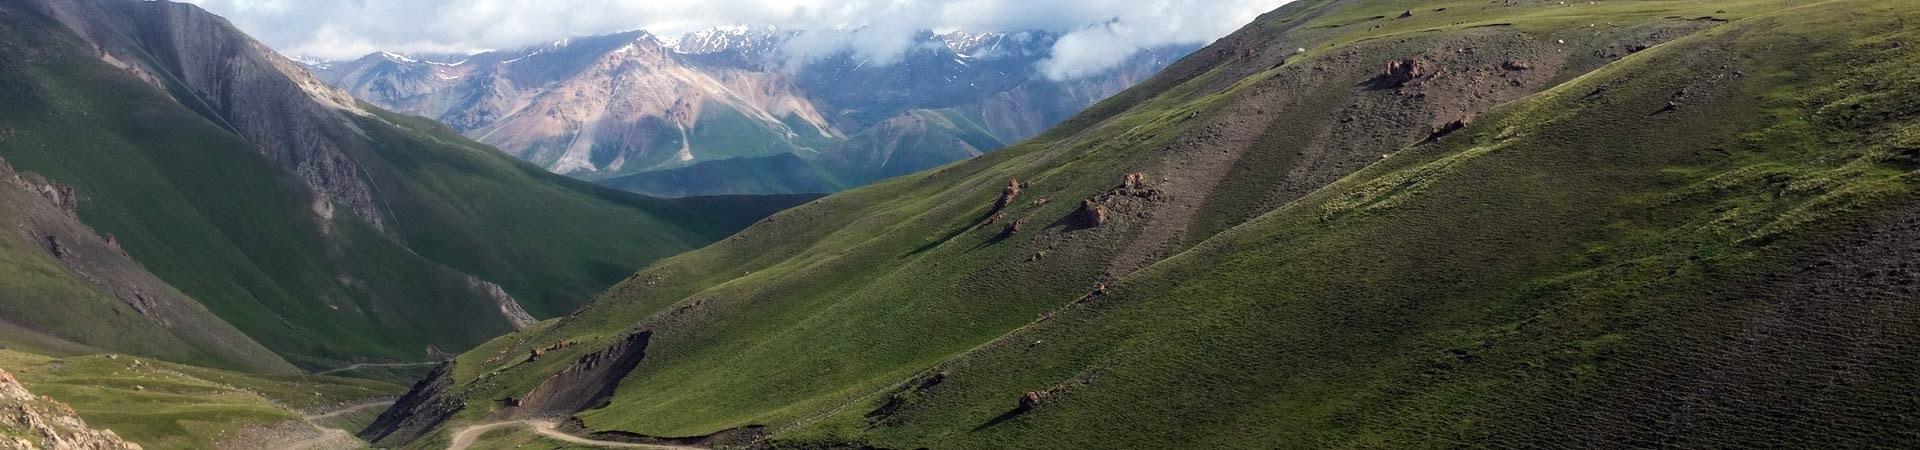 grüne Landschaften in Kirgistan entdecken